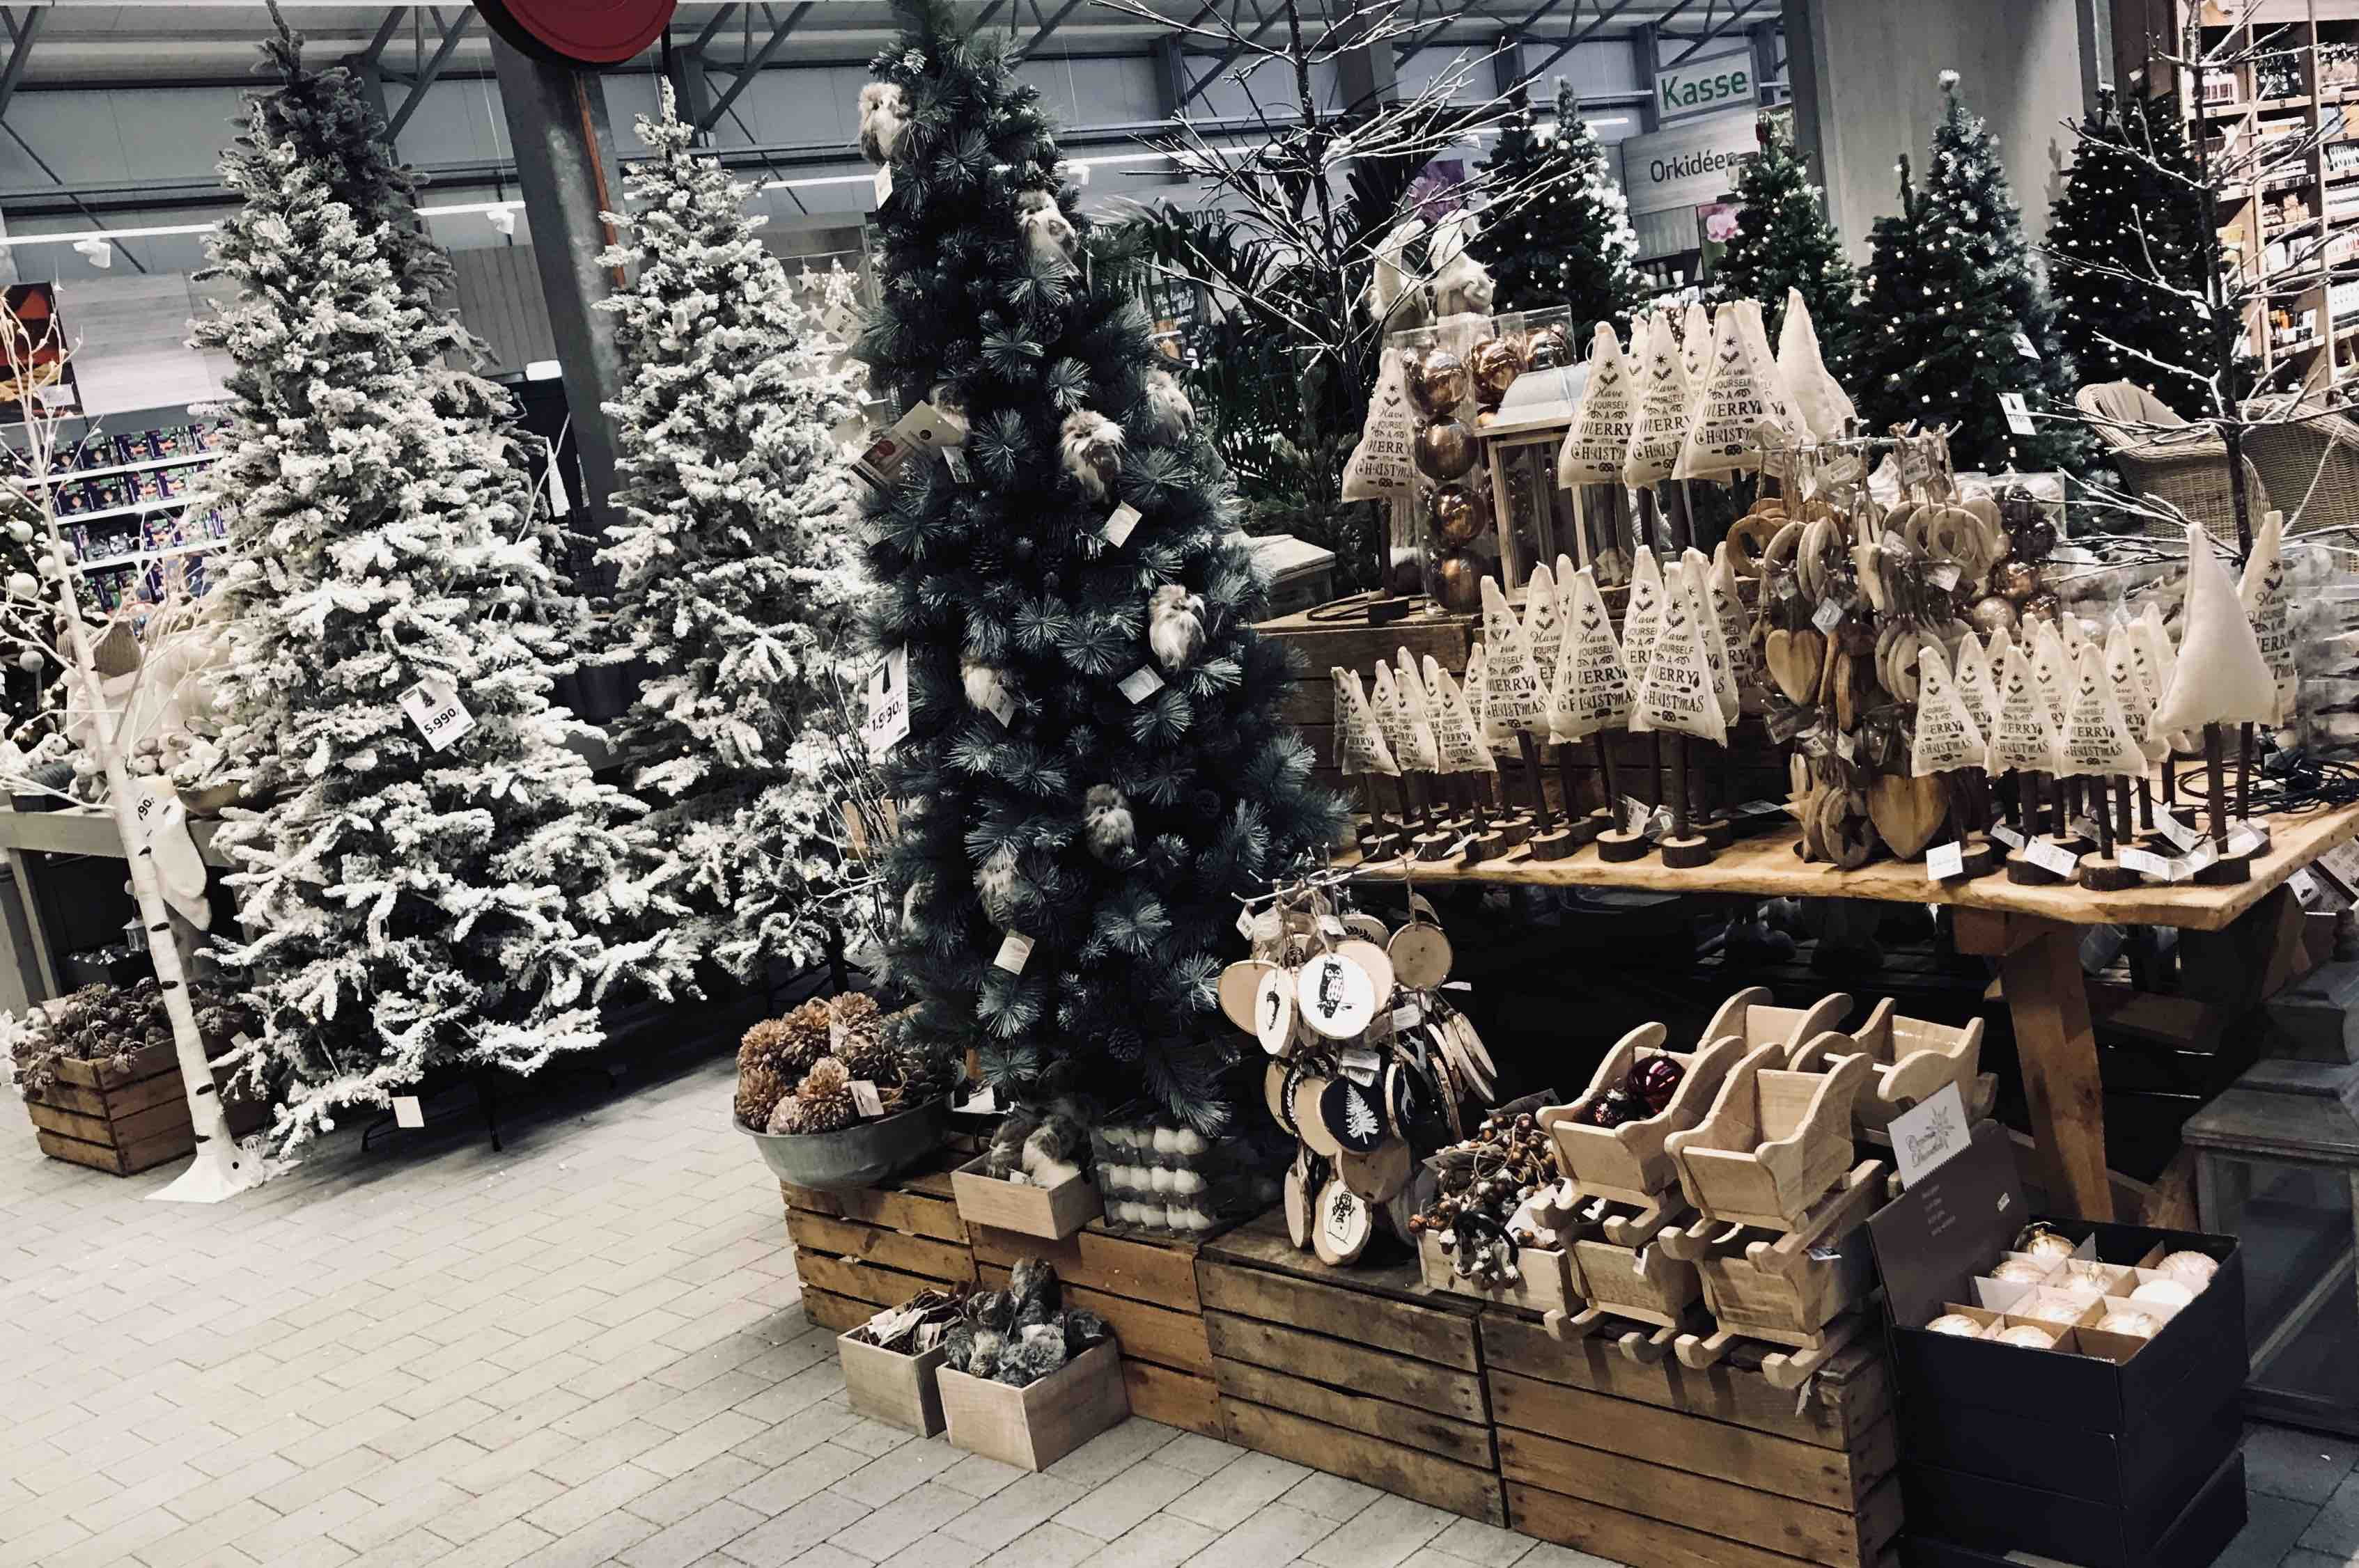 naturtro kunstig juletre